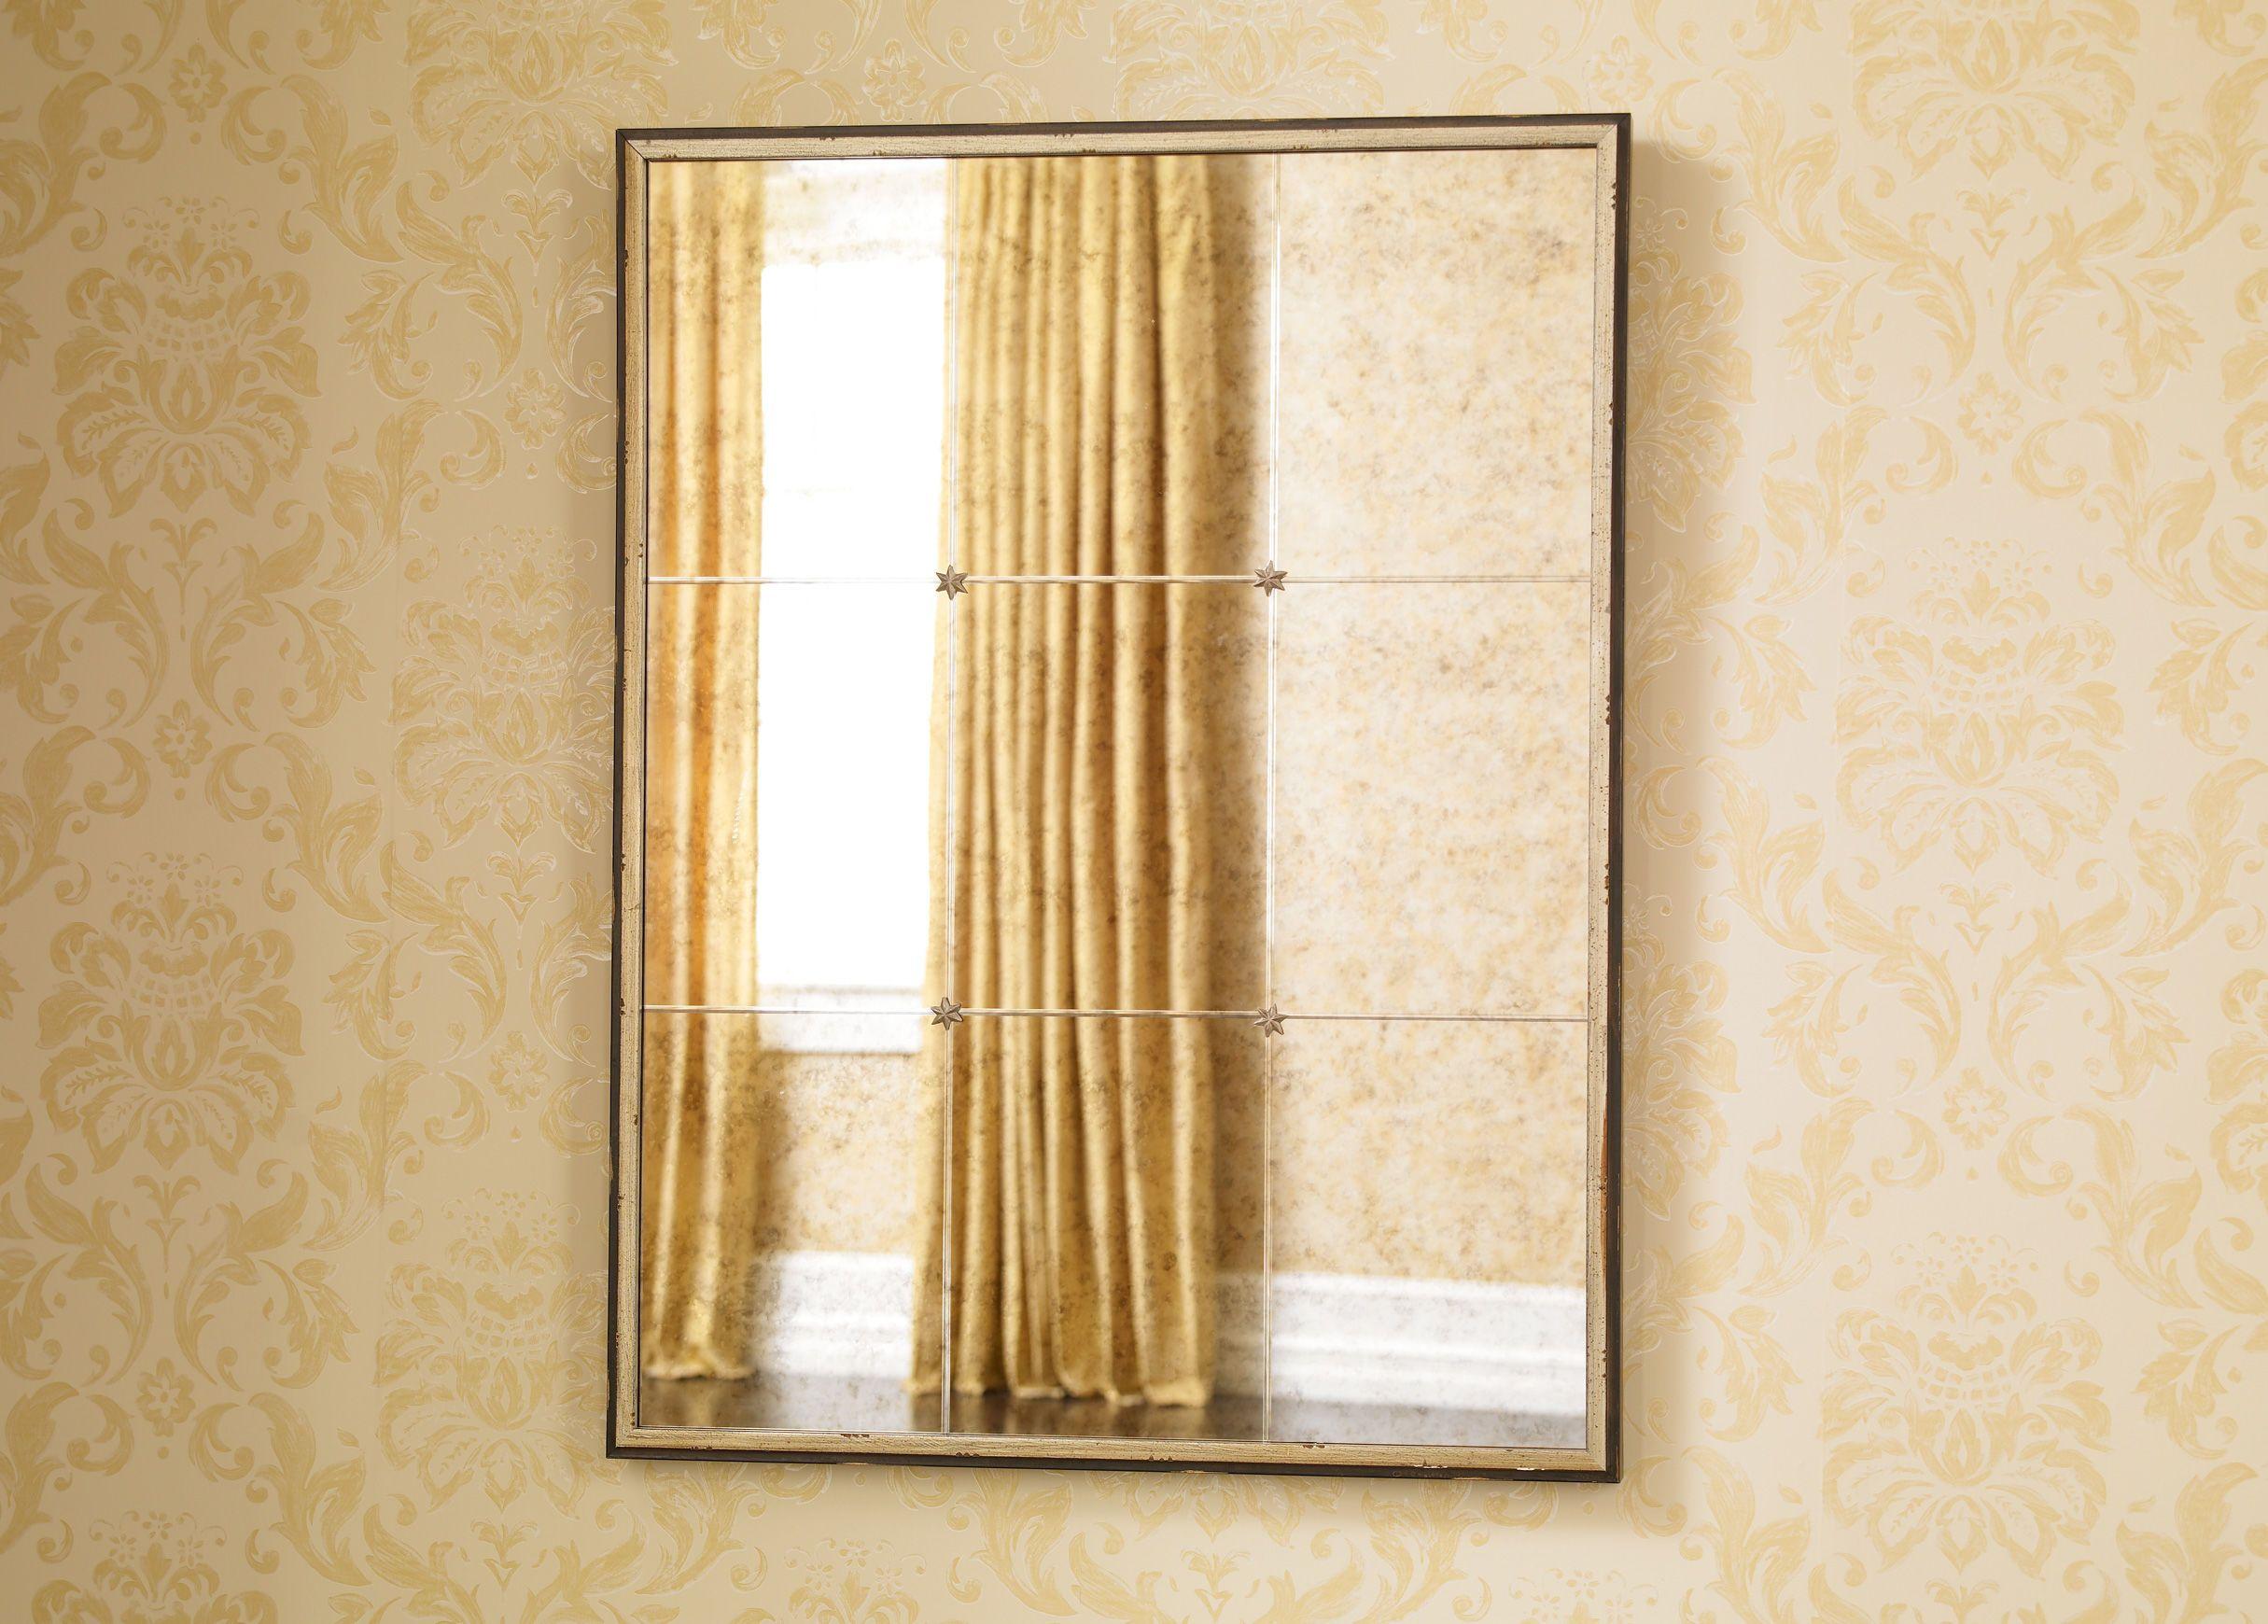 Rosette Wall Mirror   Master Bedroom   Pinterest   Rosettes, Mirror ...